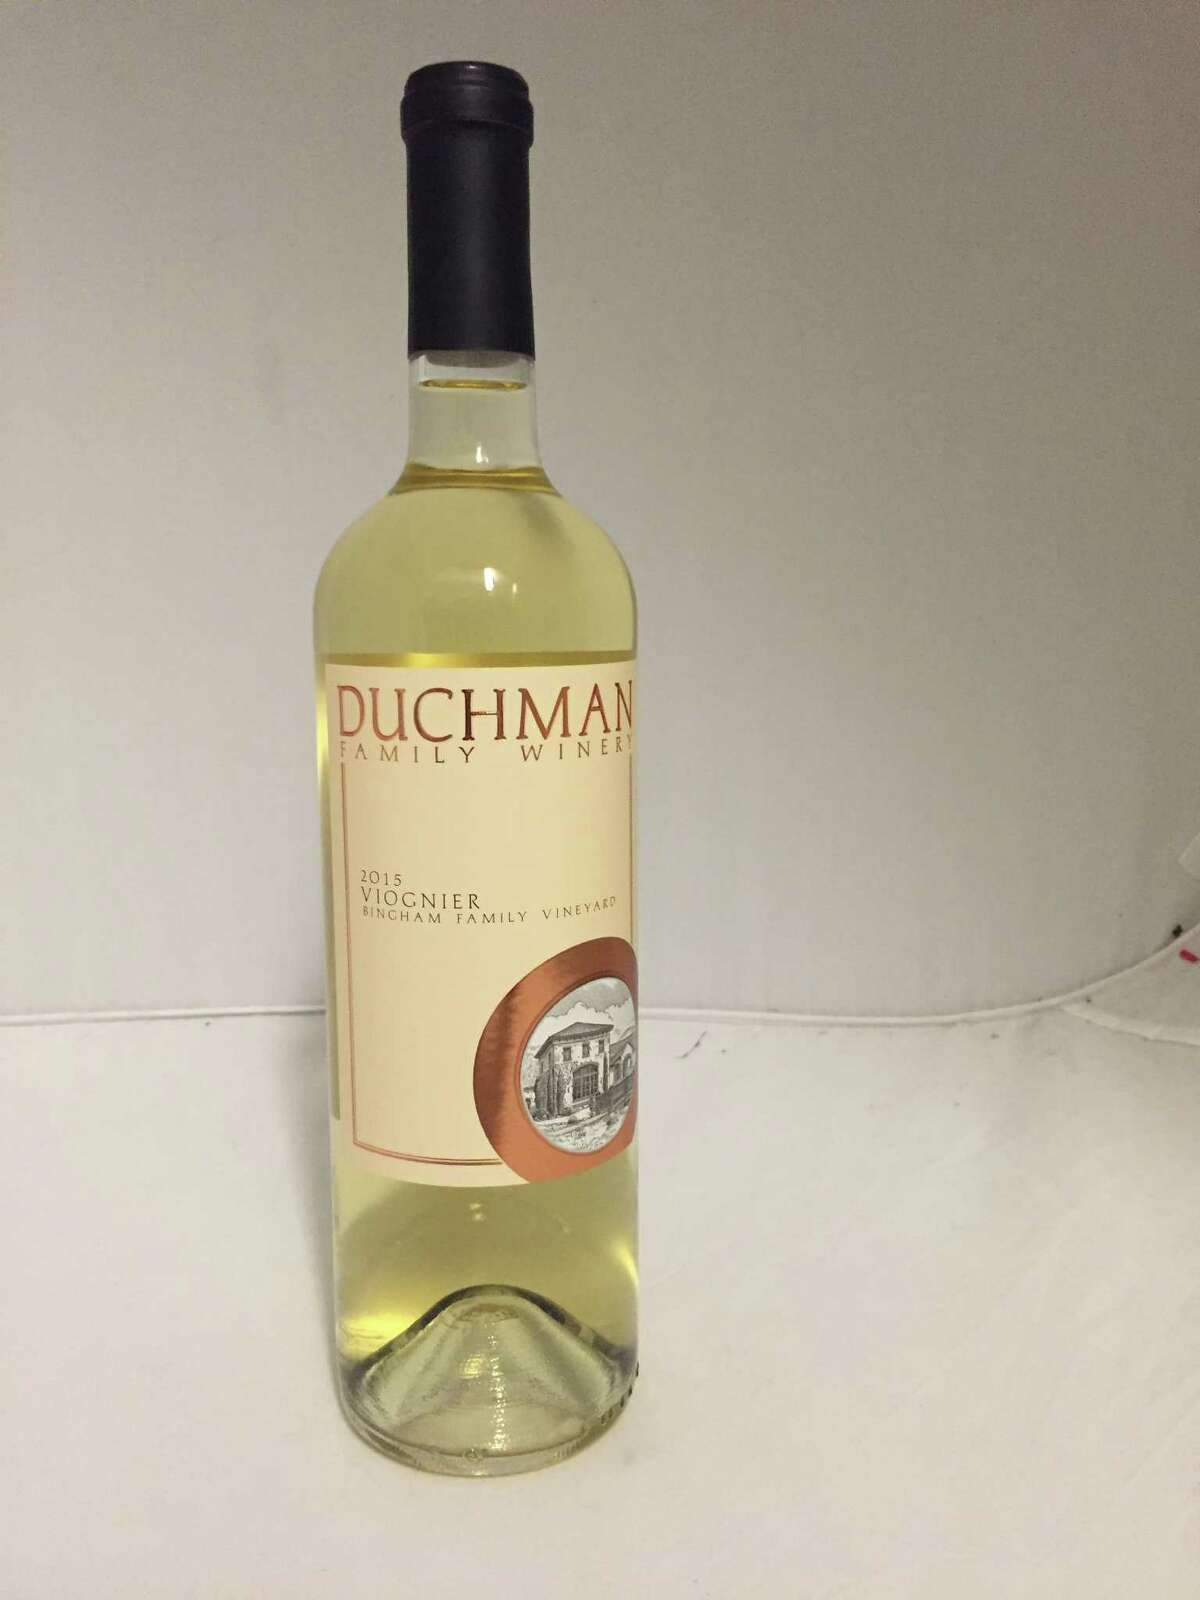 2015 Duchman Family Vineyards Viognier